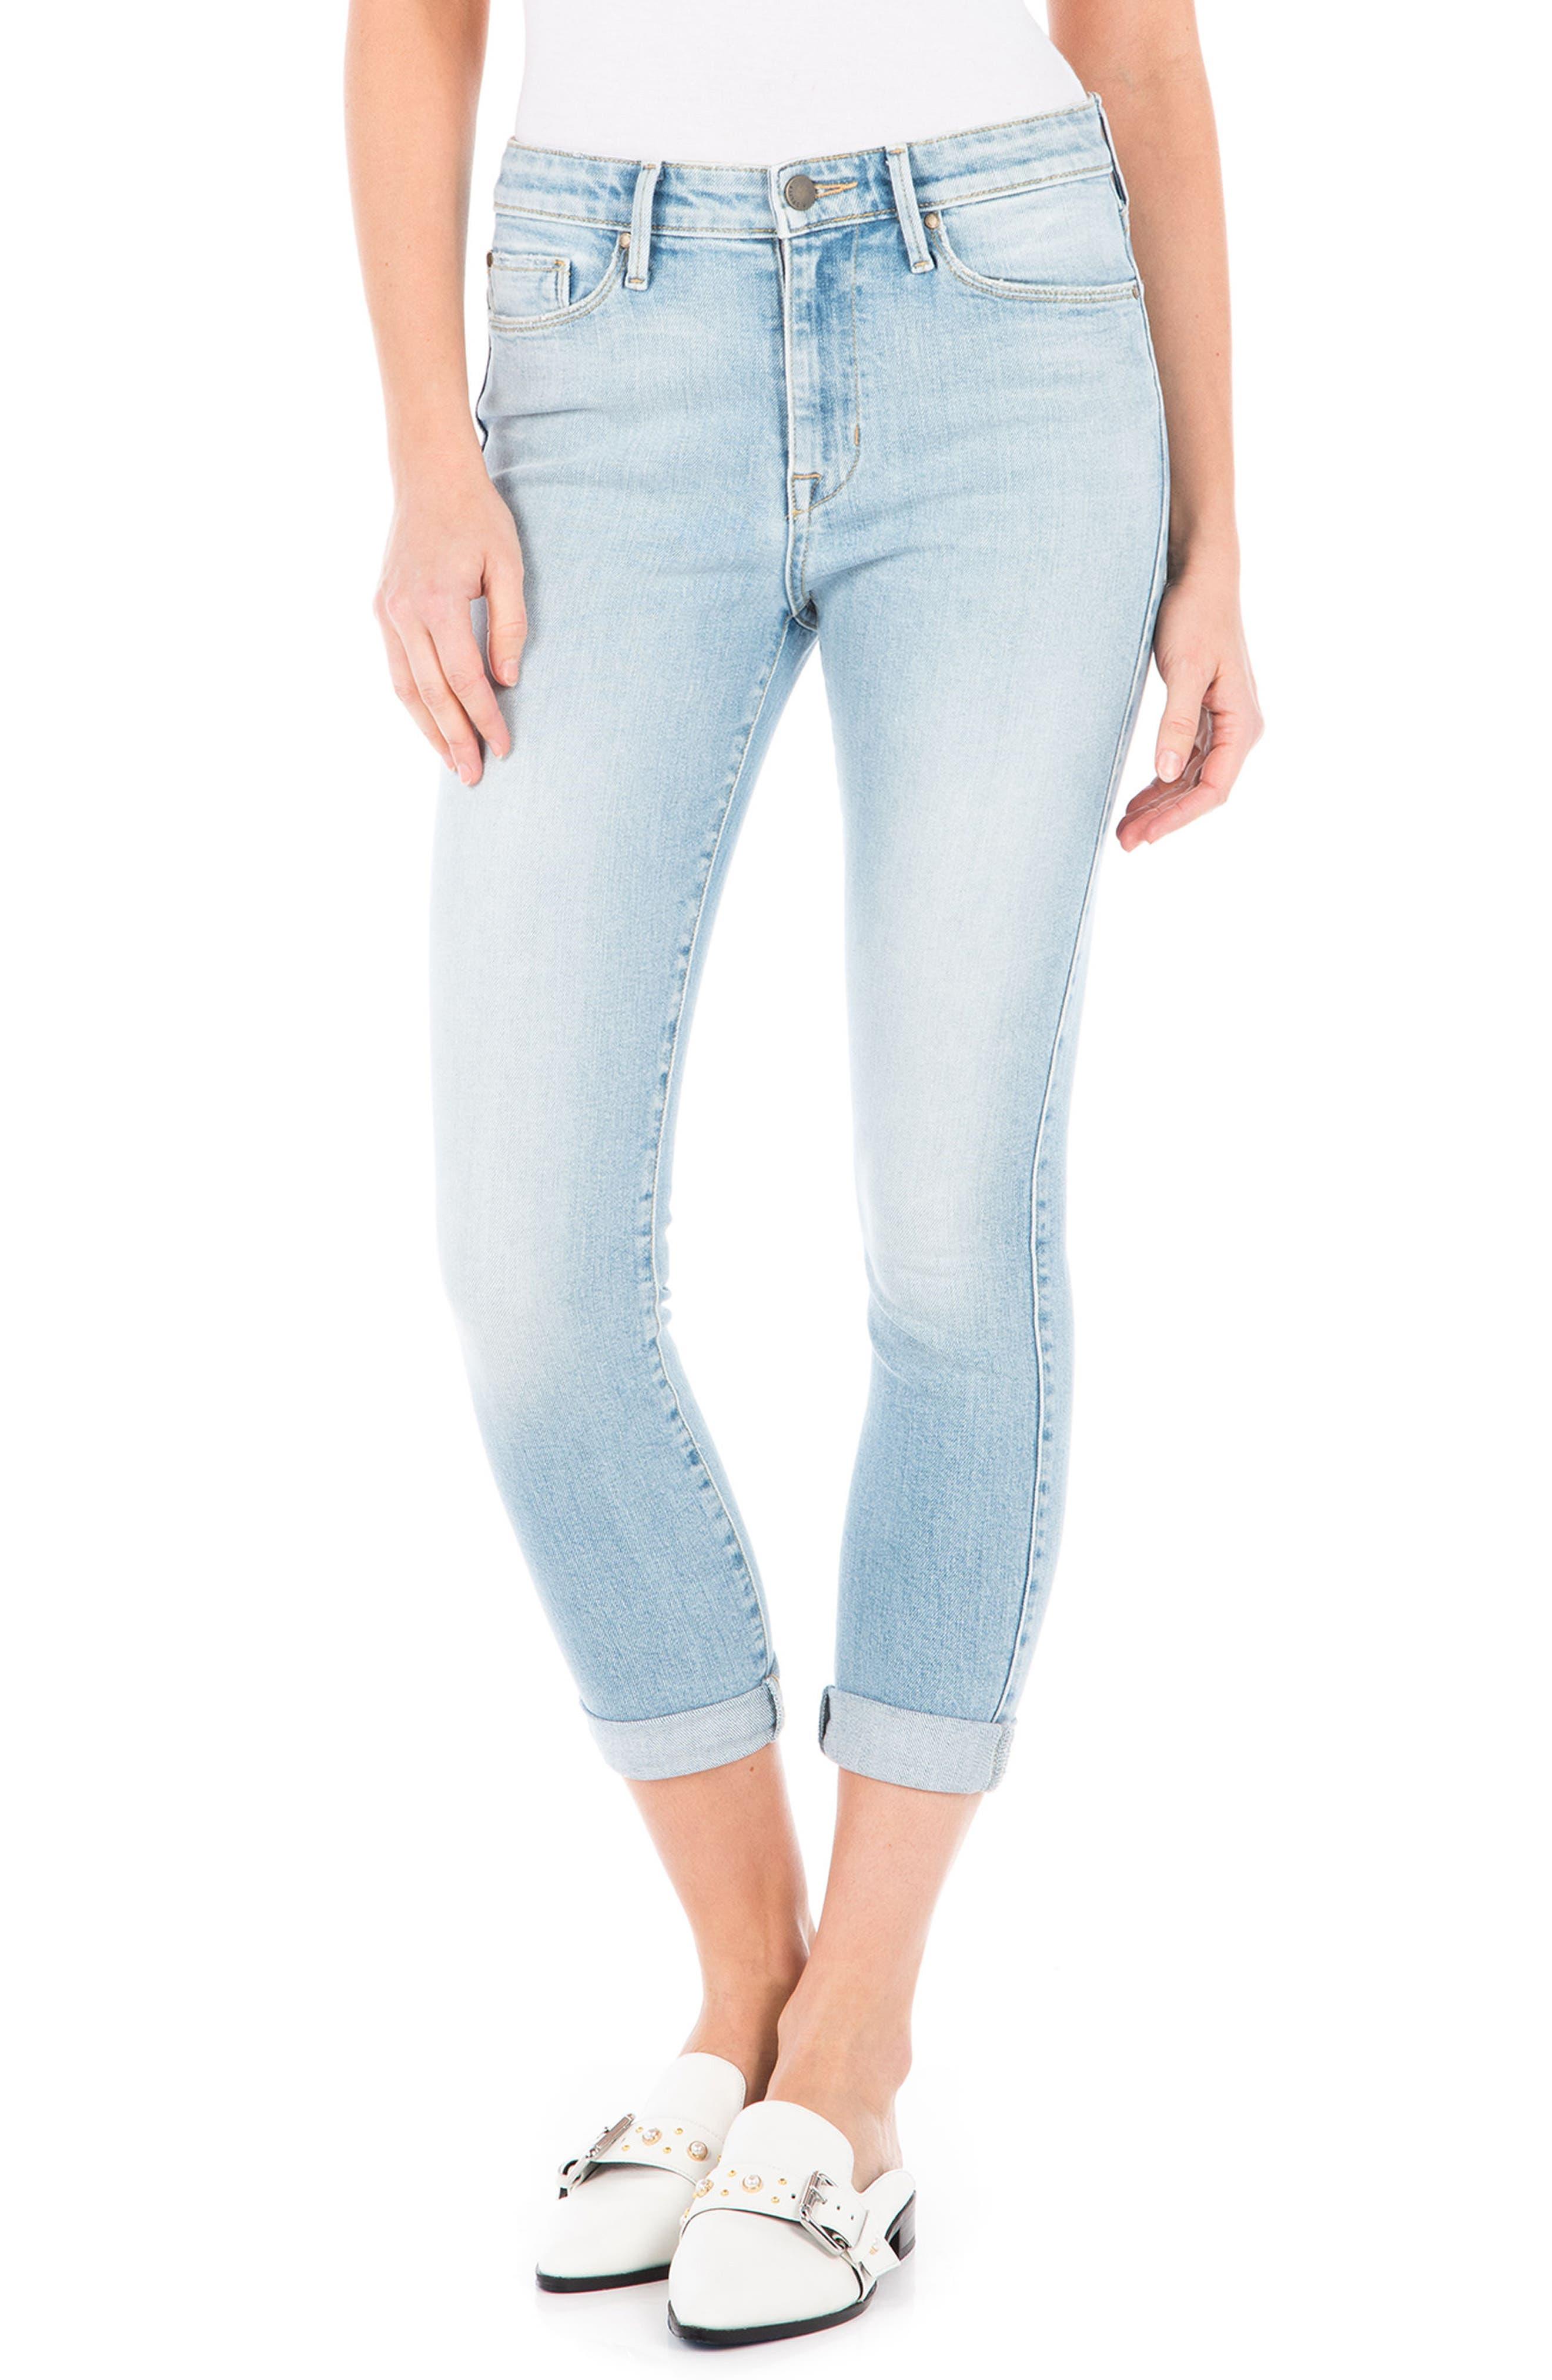 Fidelity Denim Gwen High Waist Crop Skinny Jeans (Daydream Blue)